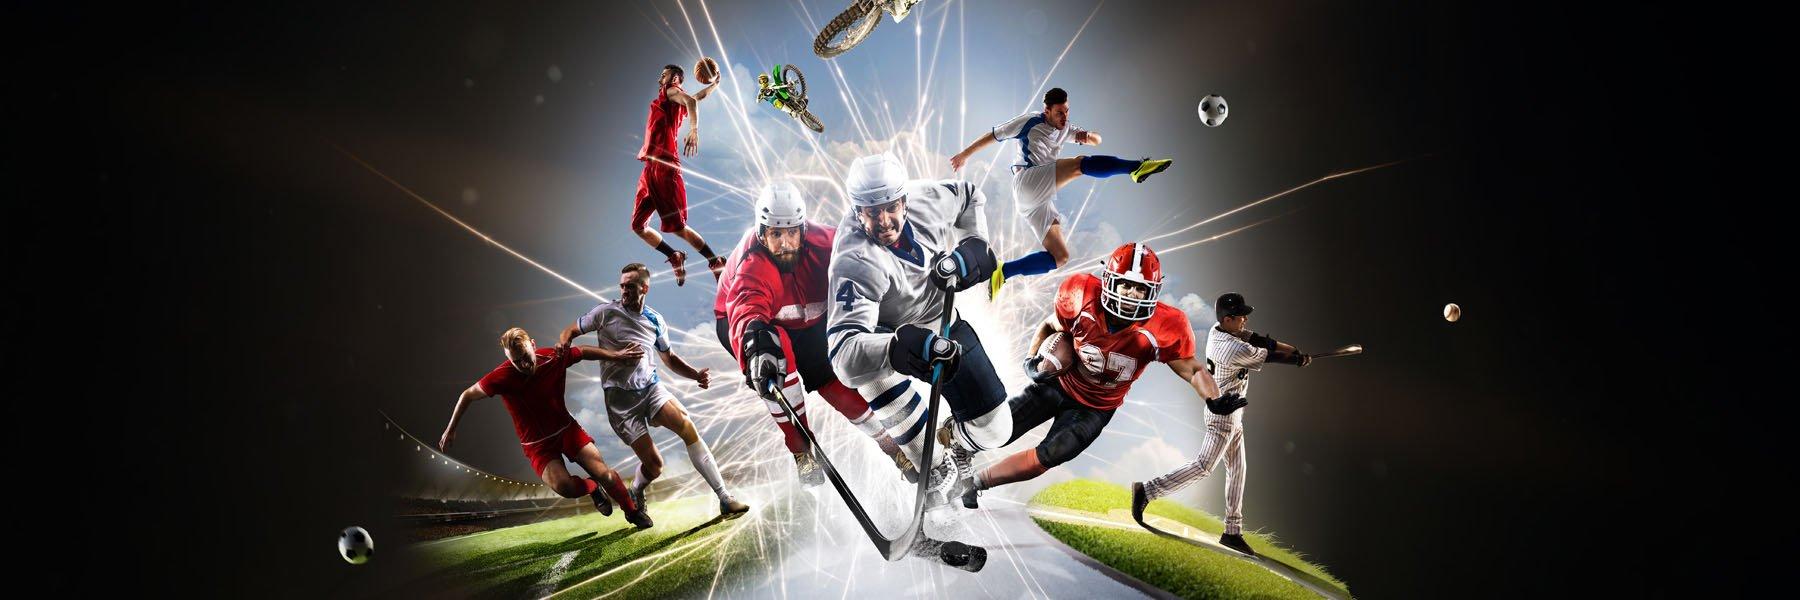 Sports club management app